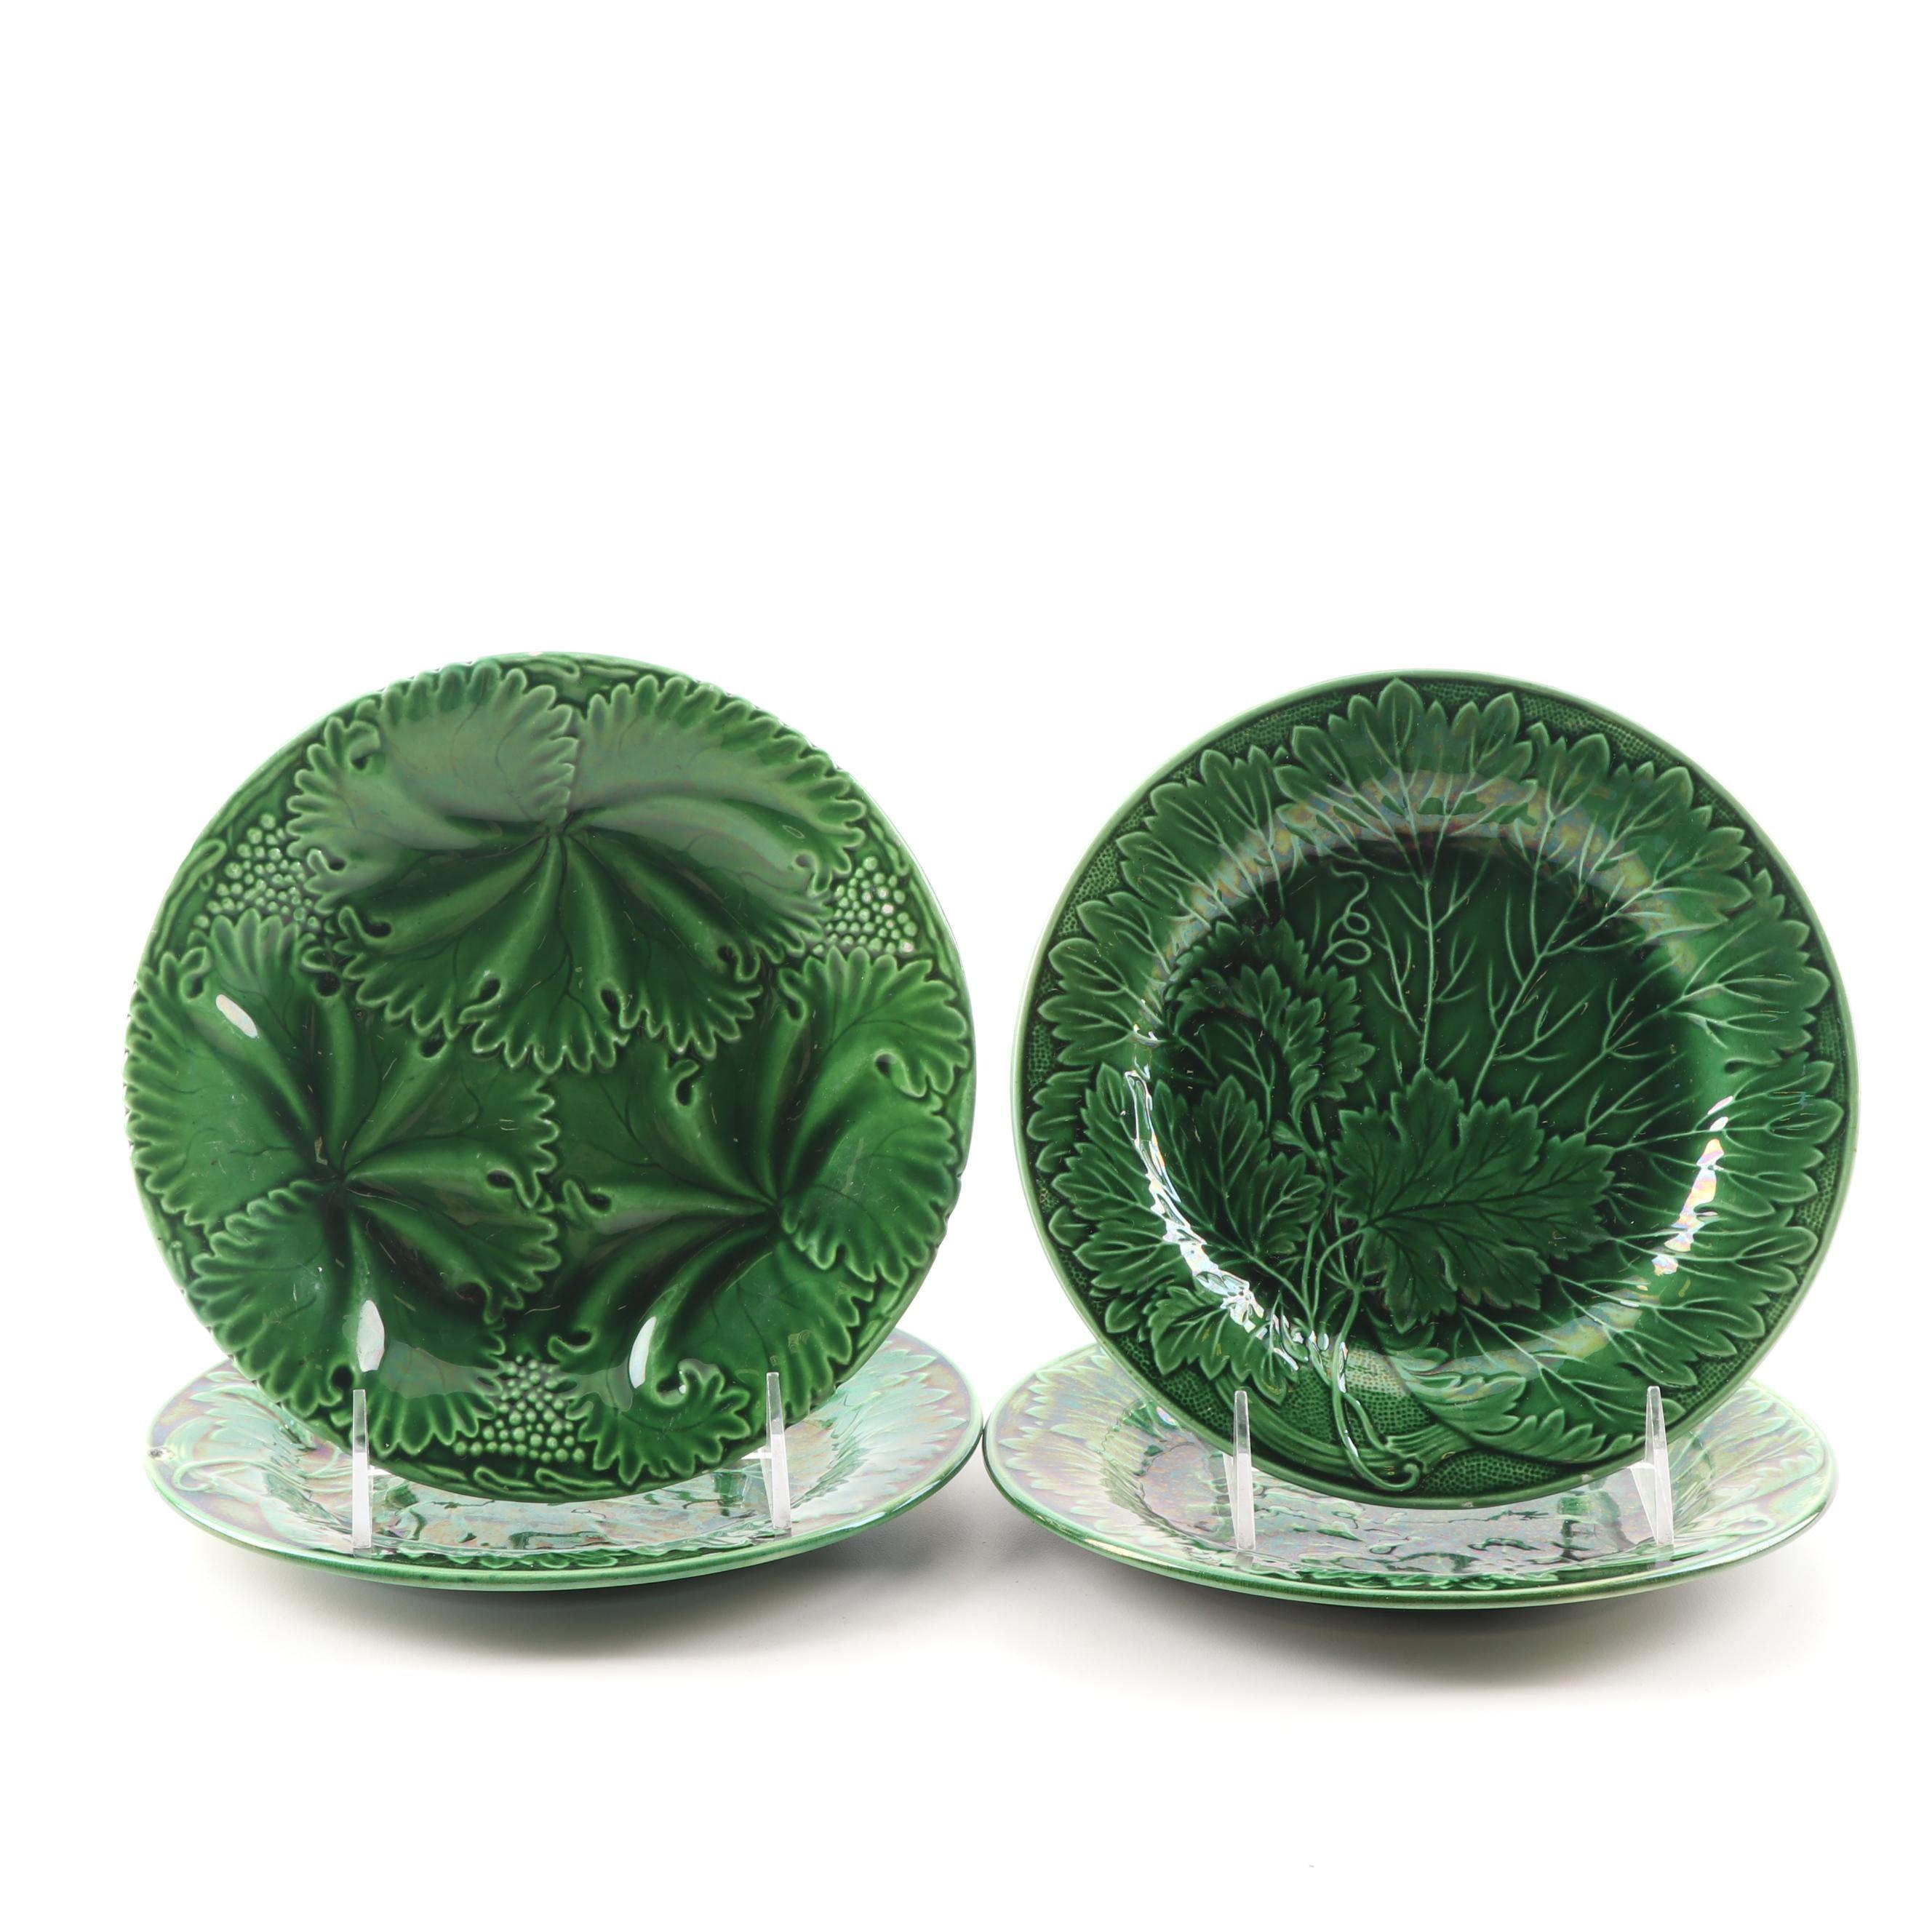 Green Majolica Leaf Plates Including Hornberg, 19th Century